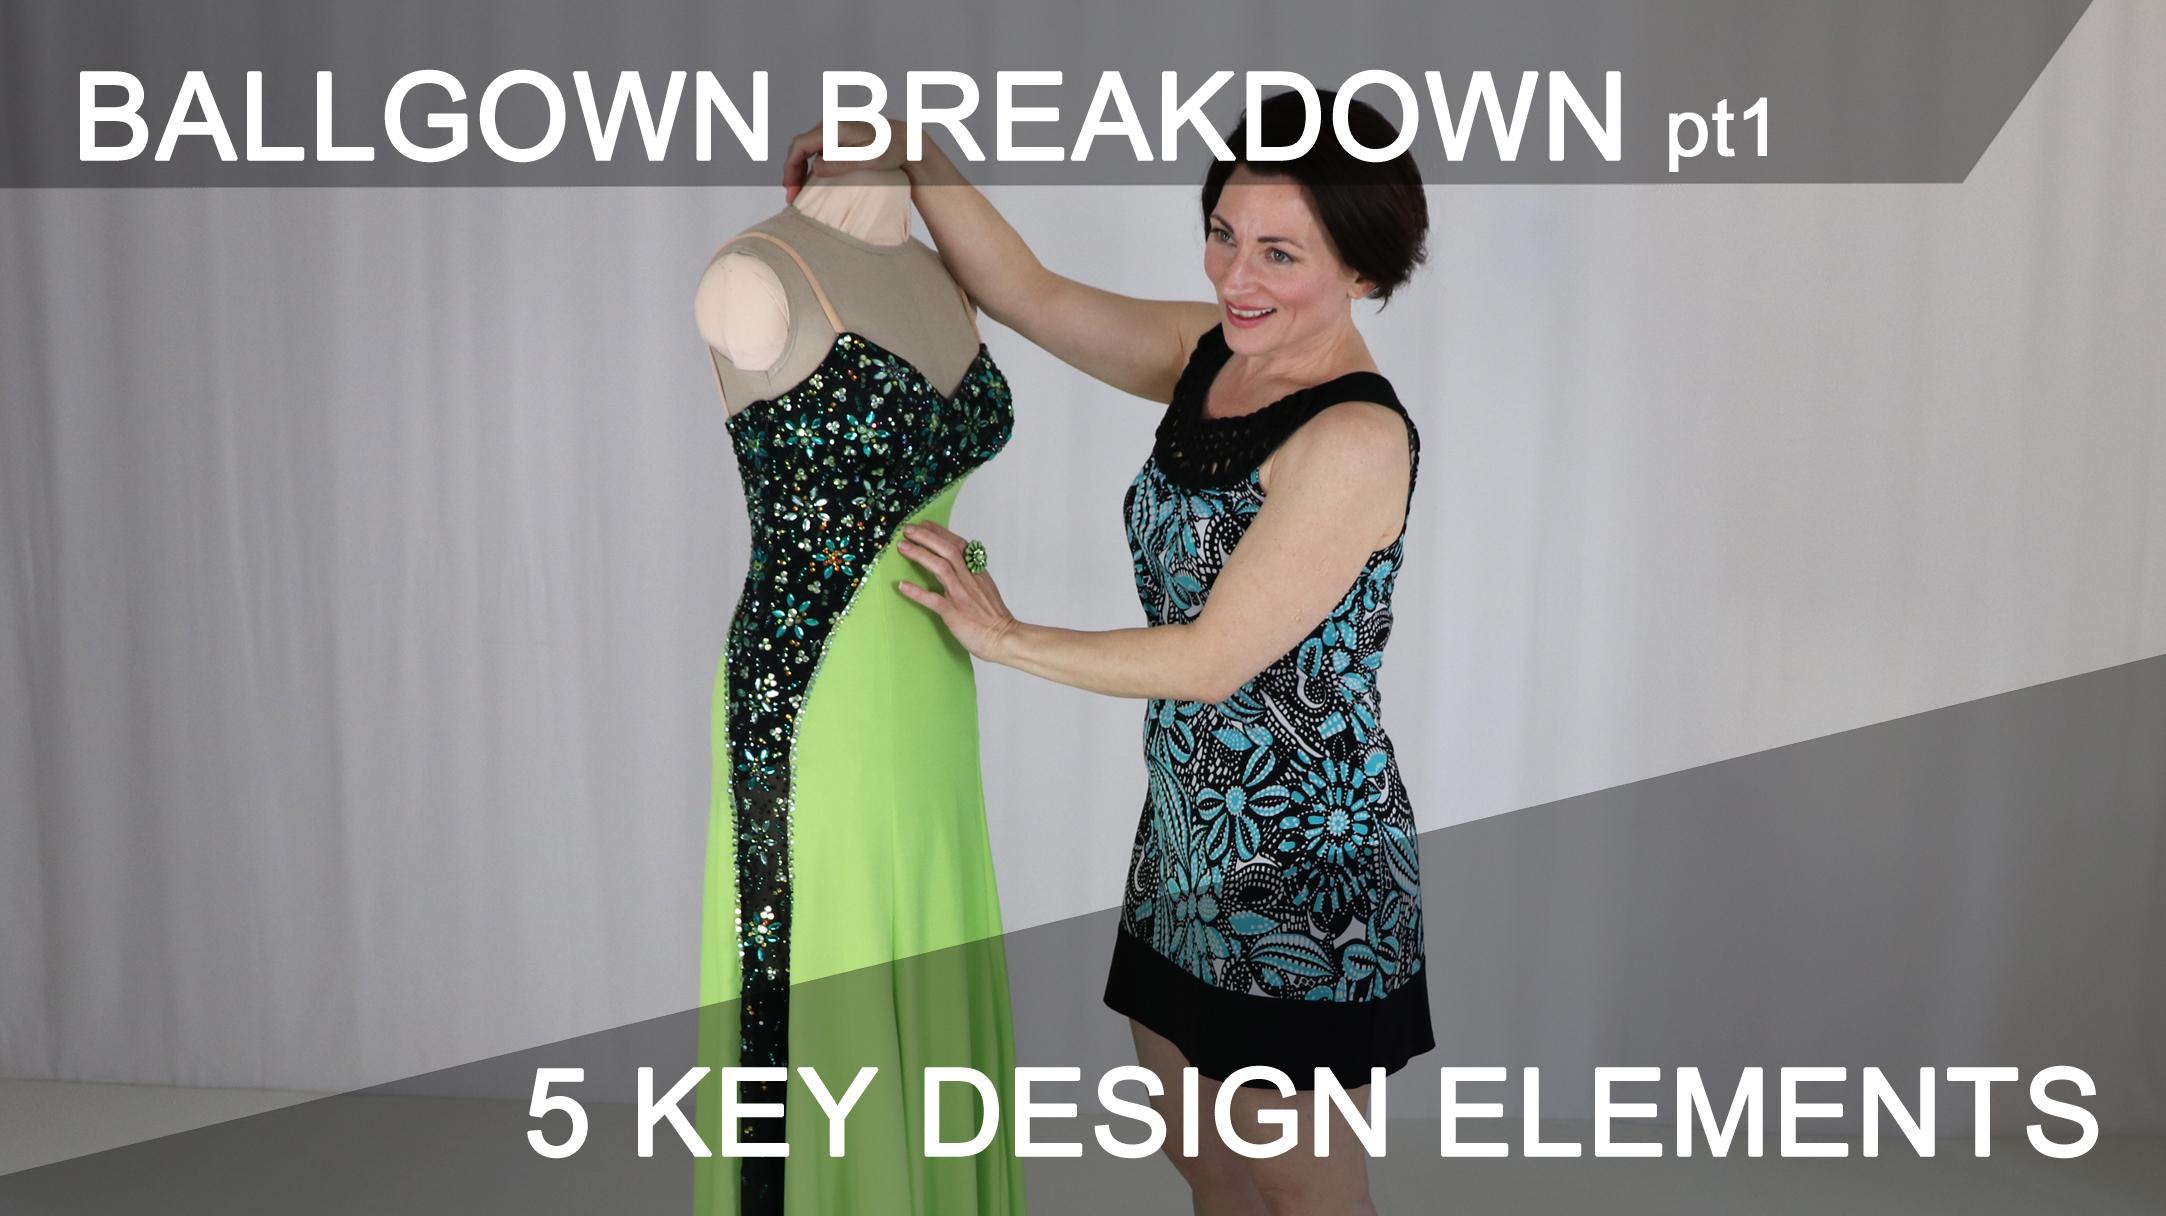 Strong Design Elements Make A Classic Ballgown Shine